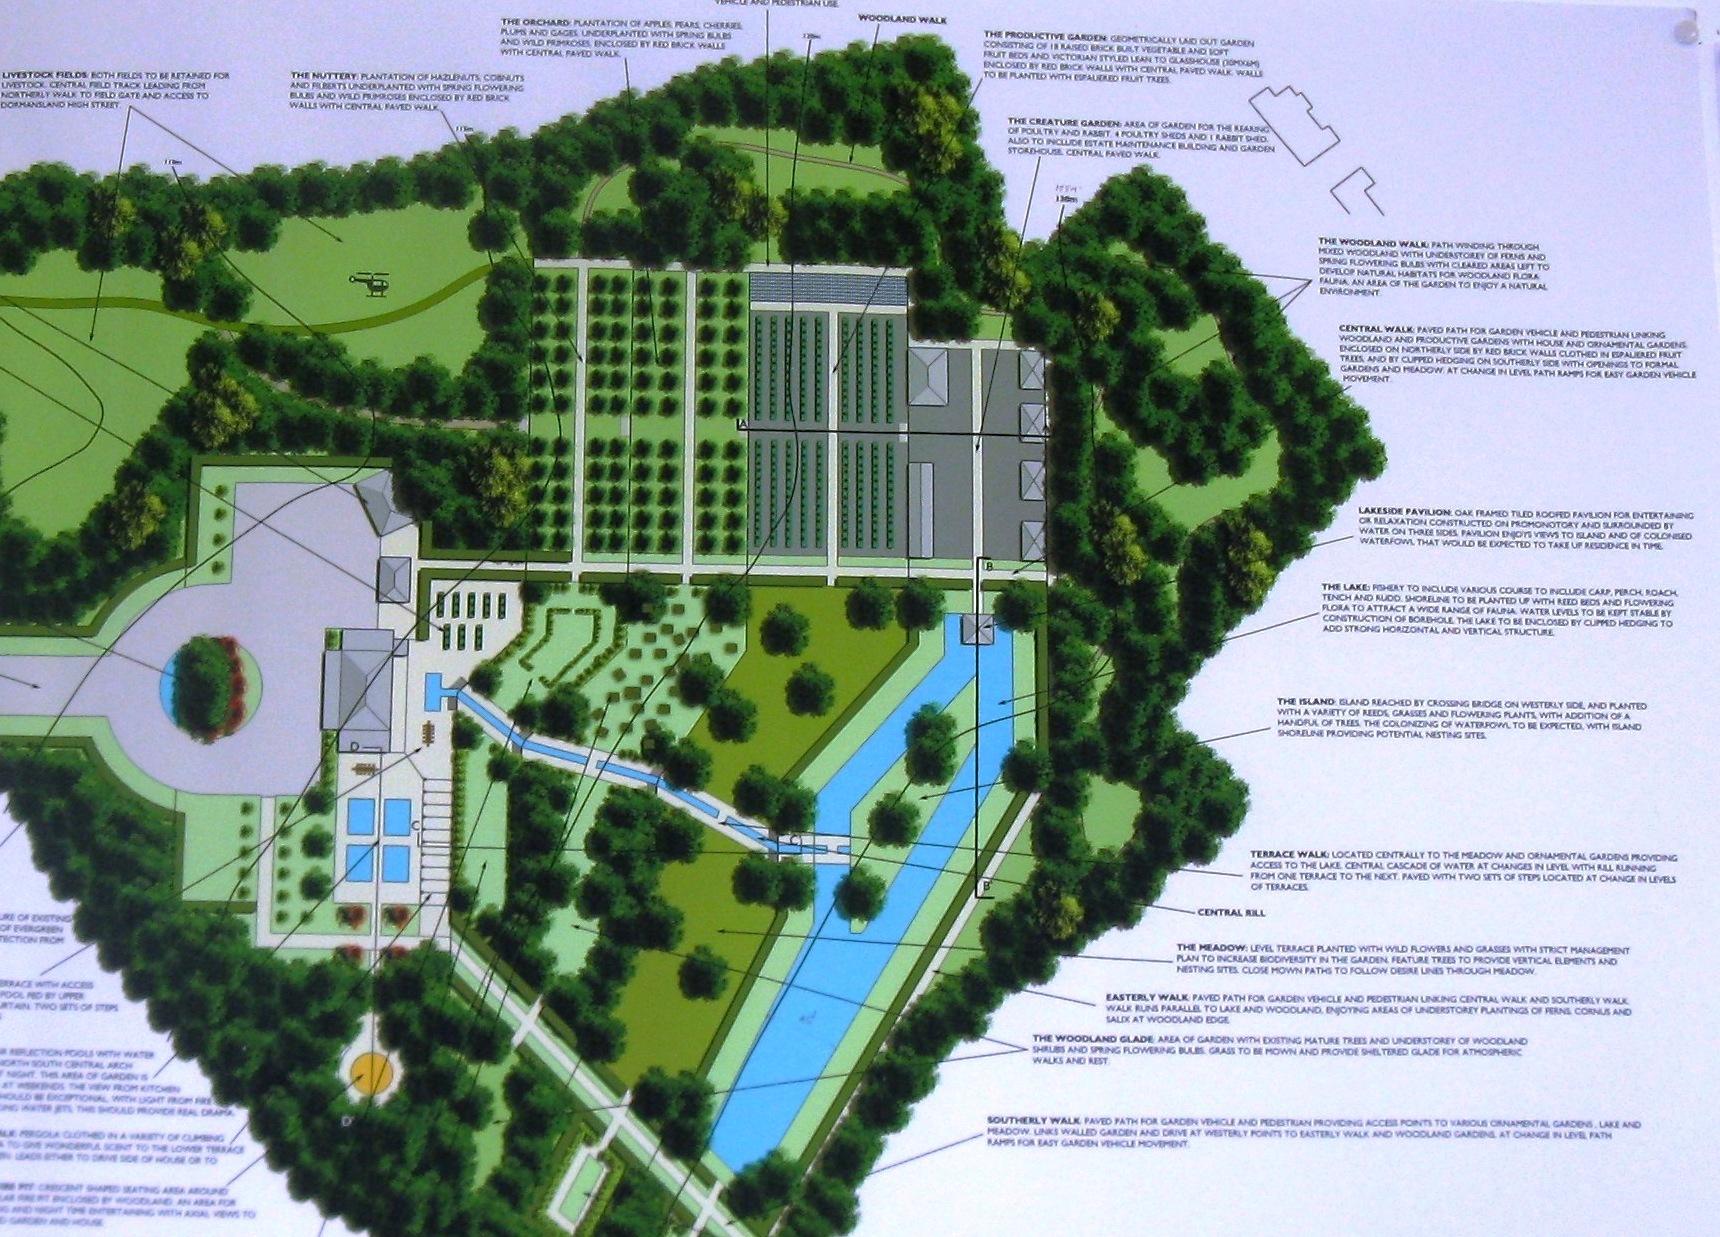 university of greenwich at hadlow | terrain